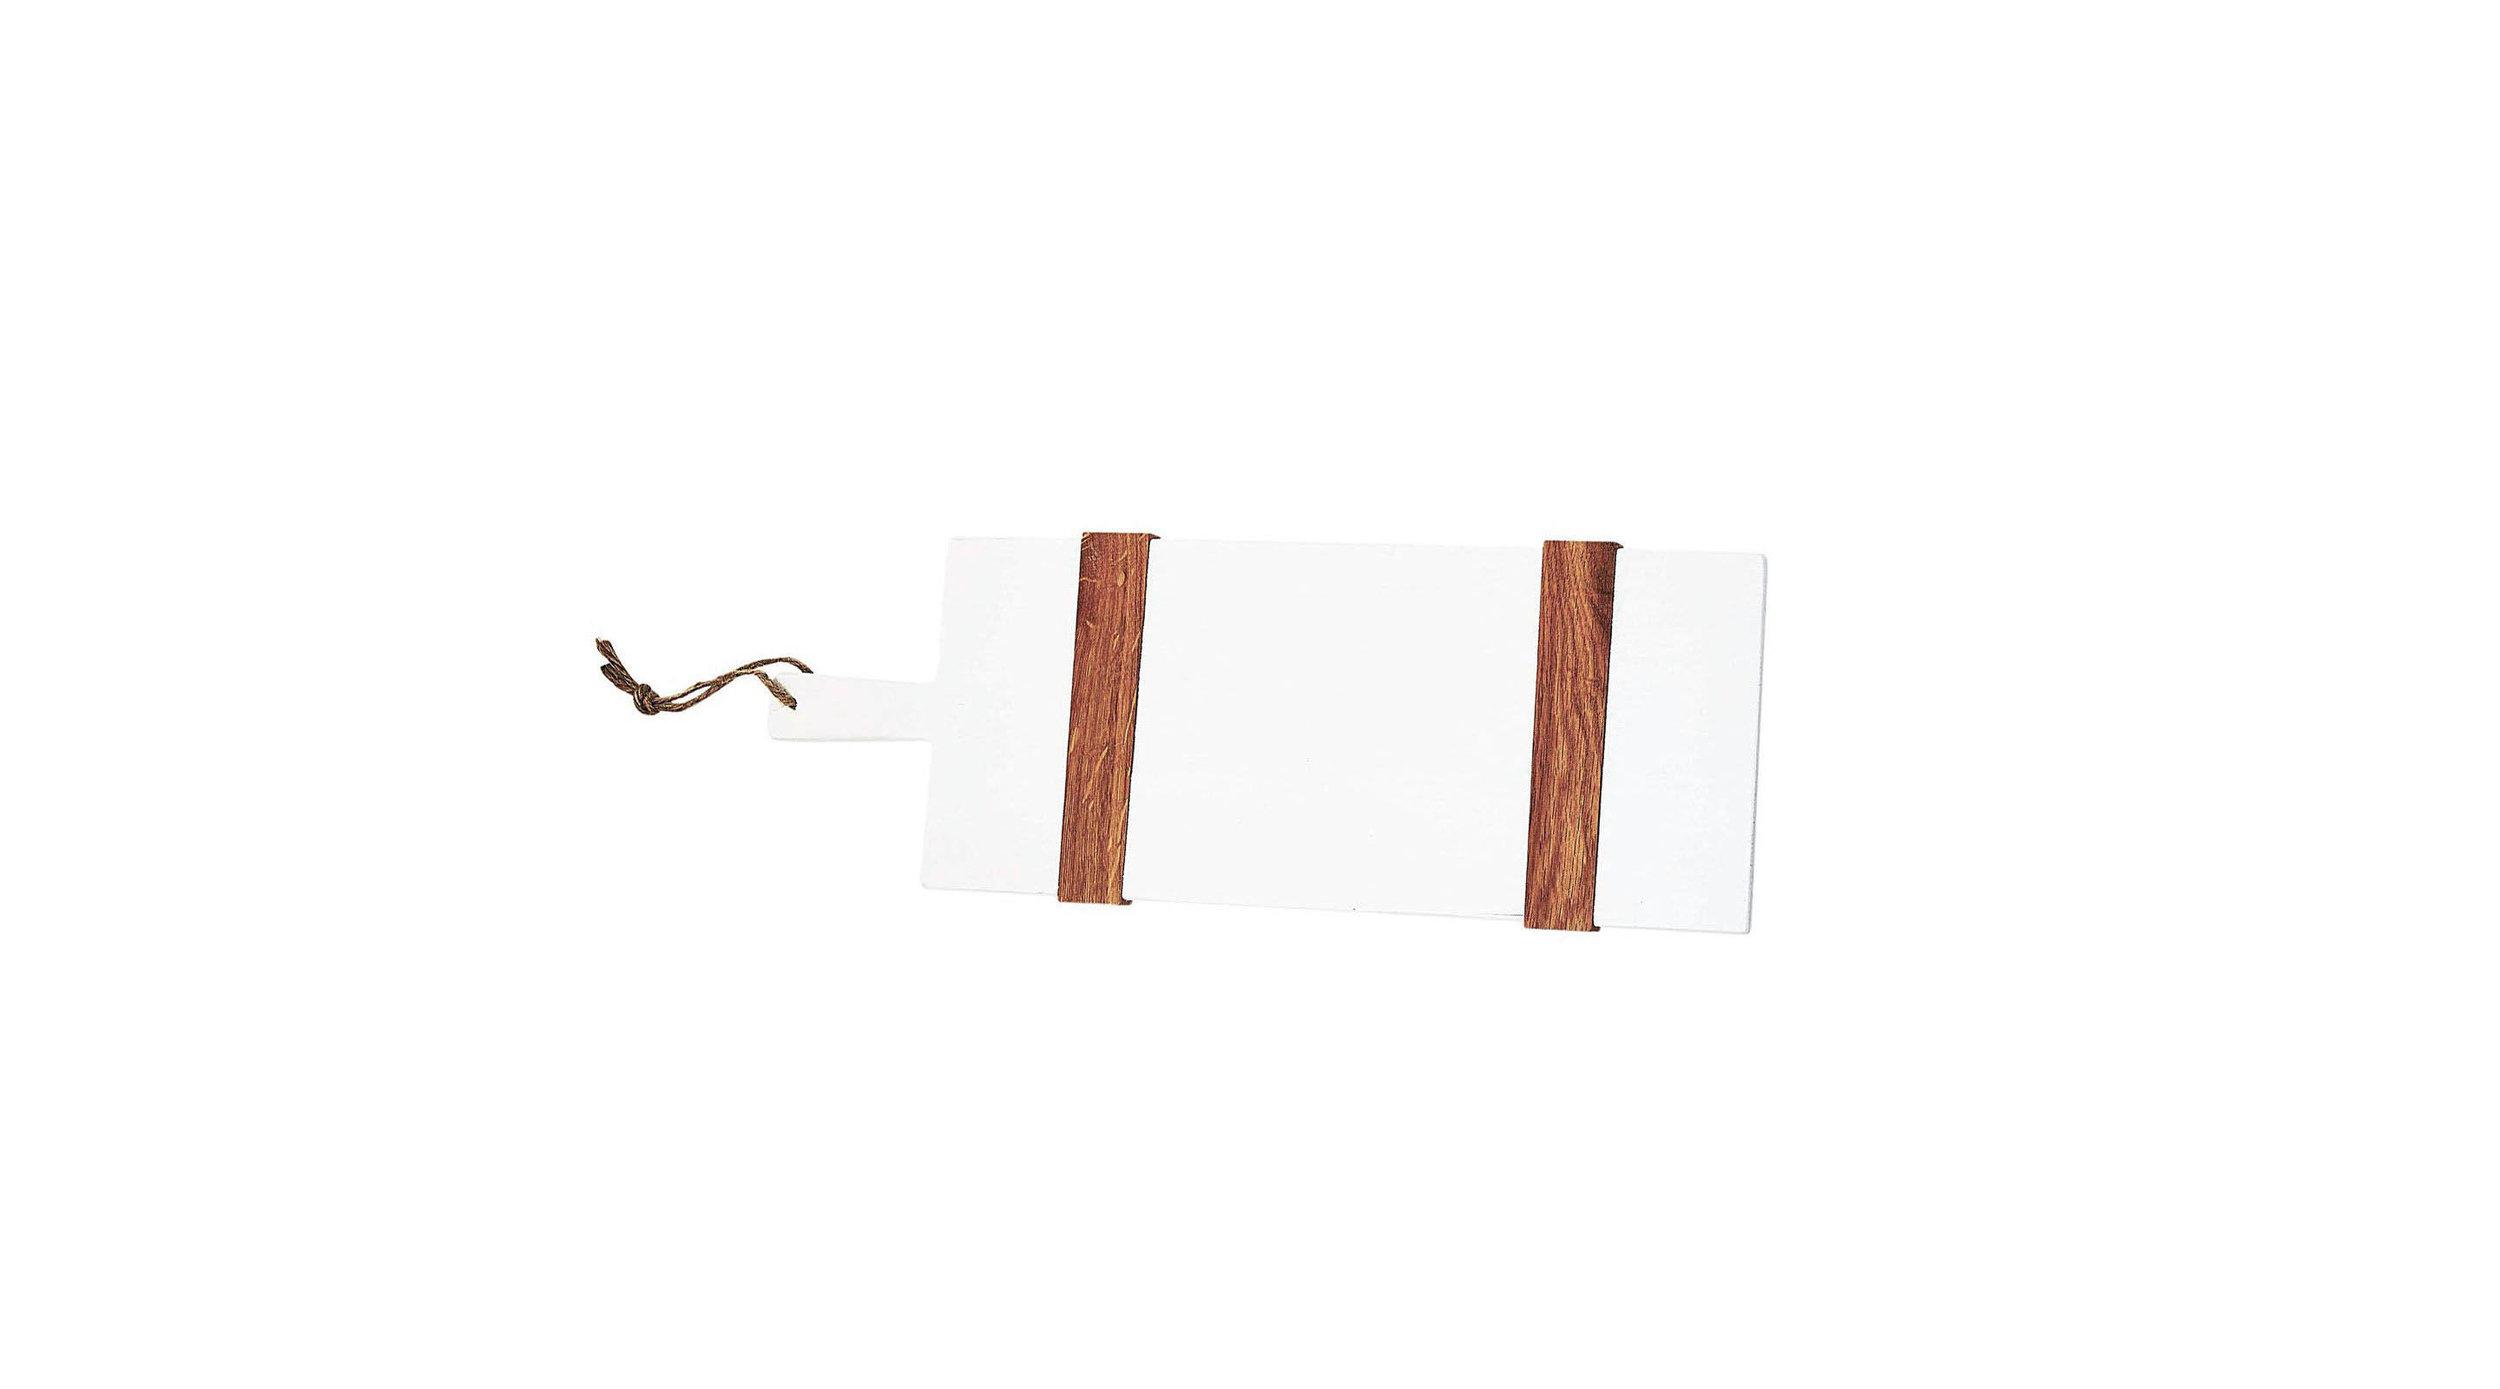 White_Cutting_Board-Small_1600x1600.jpg